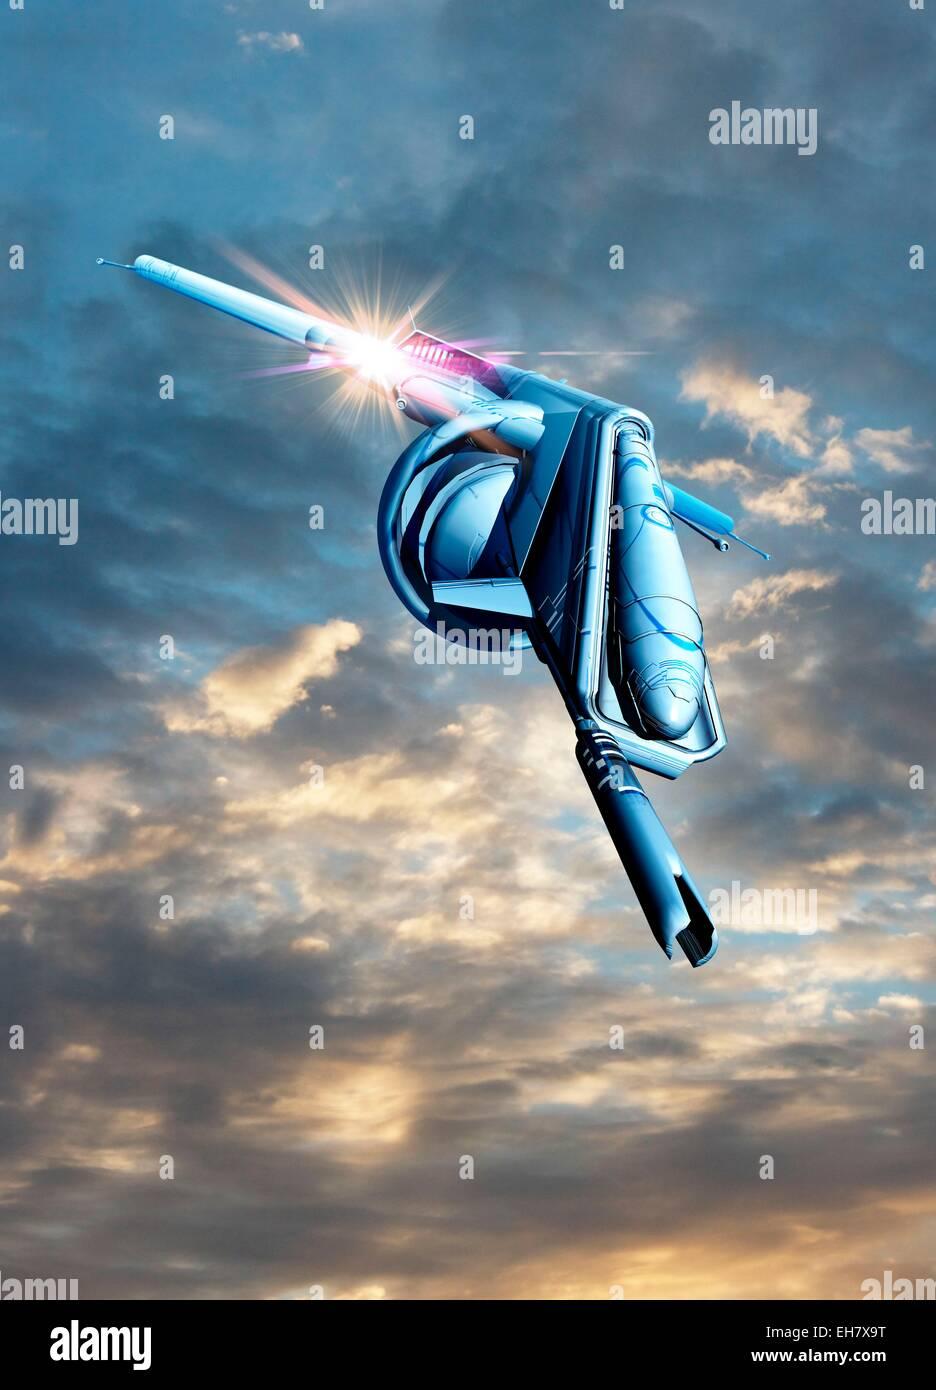 Spacecraft, illustration - Stock Image